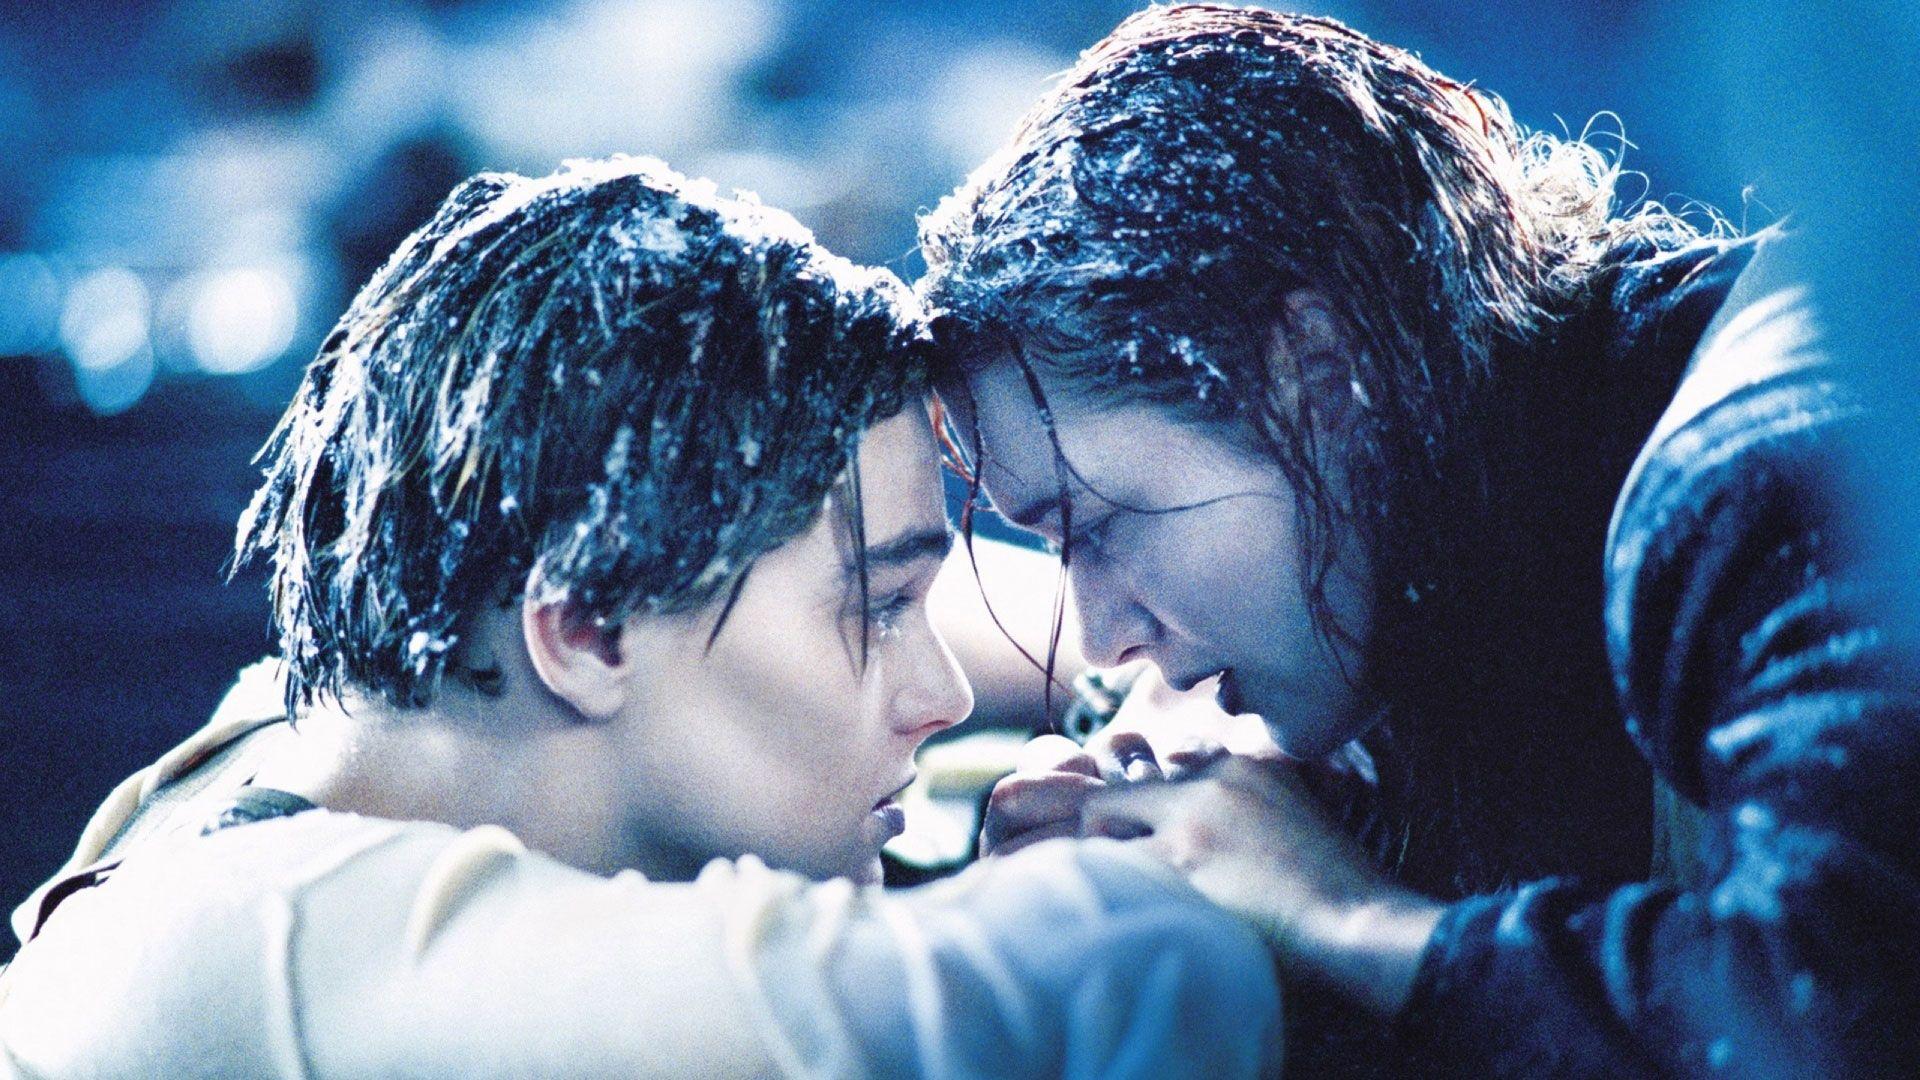 Hd Pics Photos Stunning Attractive Love 185 Hd Desktop Background Wallpaper Titanic Movie Titanic Kate Winslet Leonardo Dicaprio